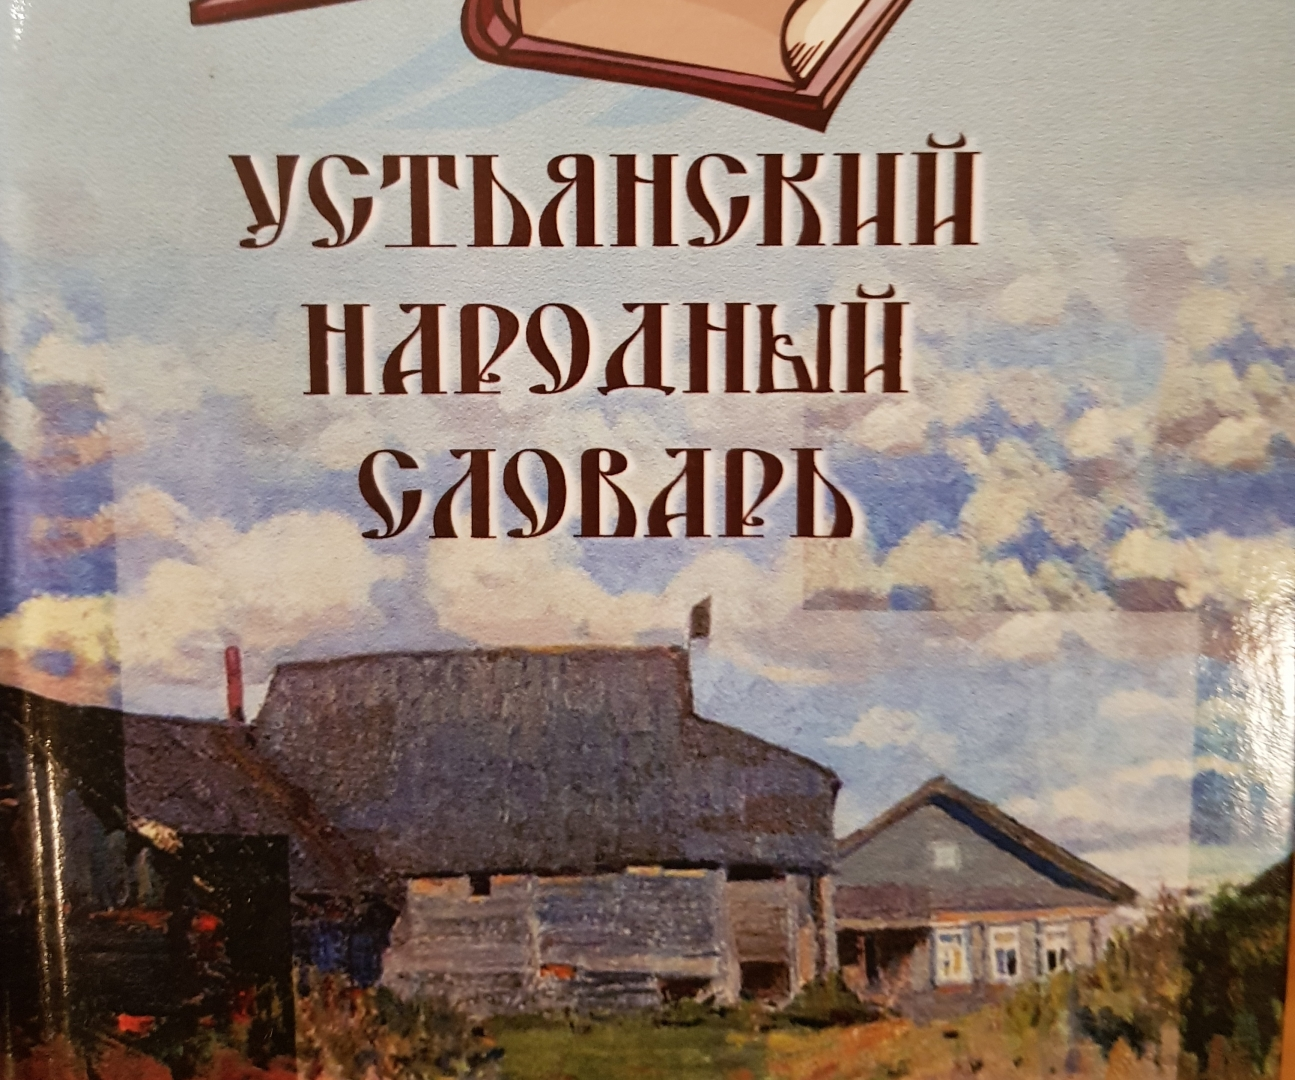 Крайний север — википедия. что такое крайний север